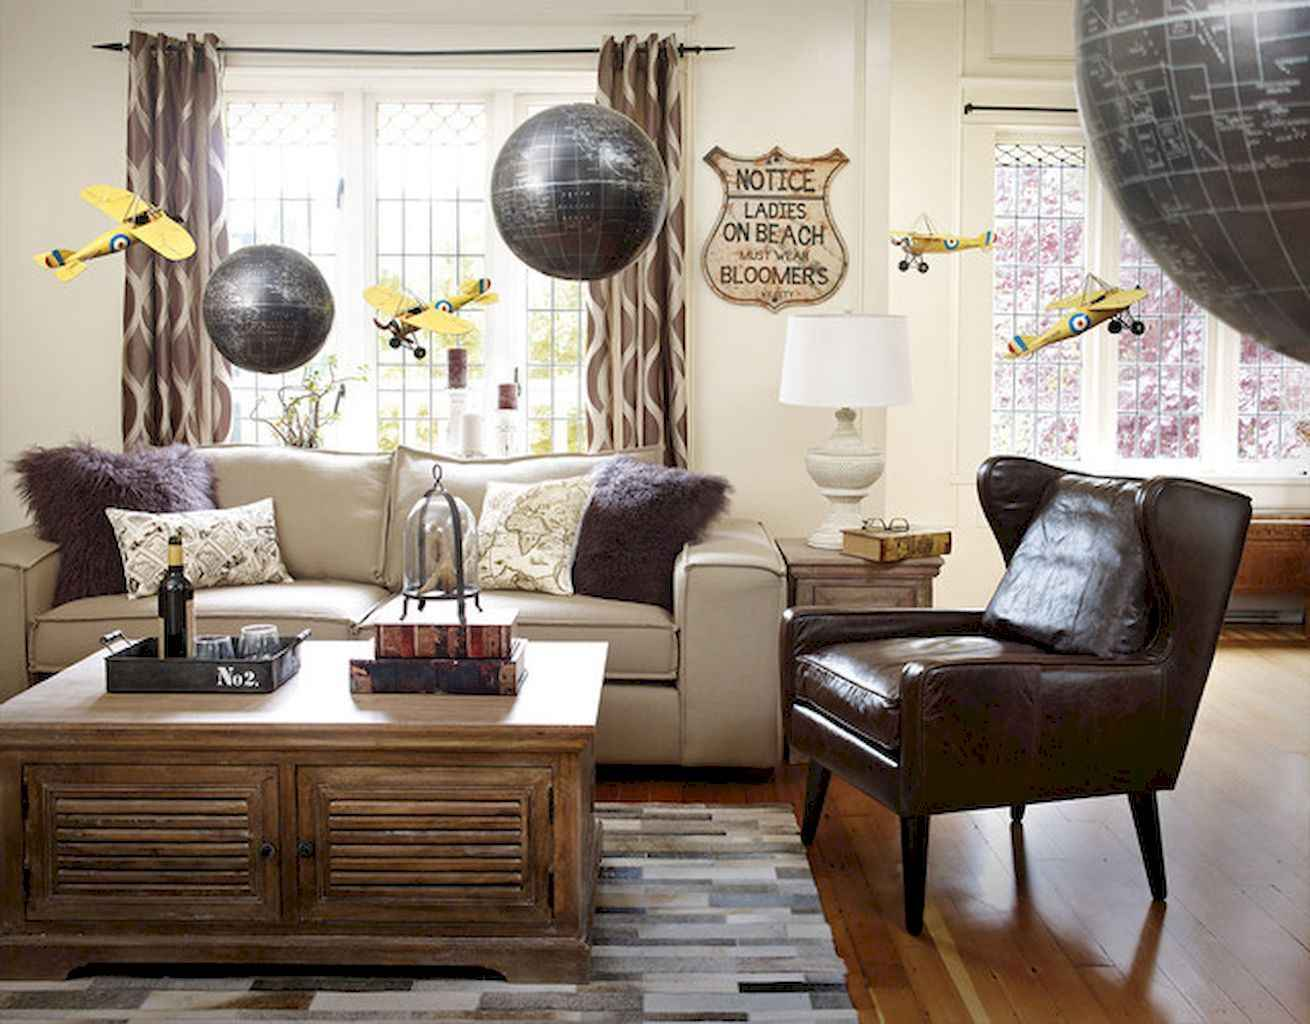 70 rustic farmhouse living room decor ideas and makeover. Black Bedroom Furniture Sets. Home Design Ideas